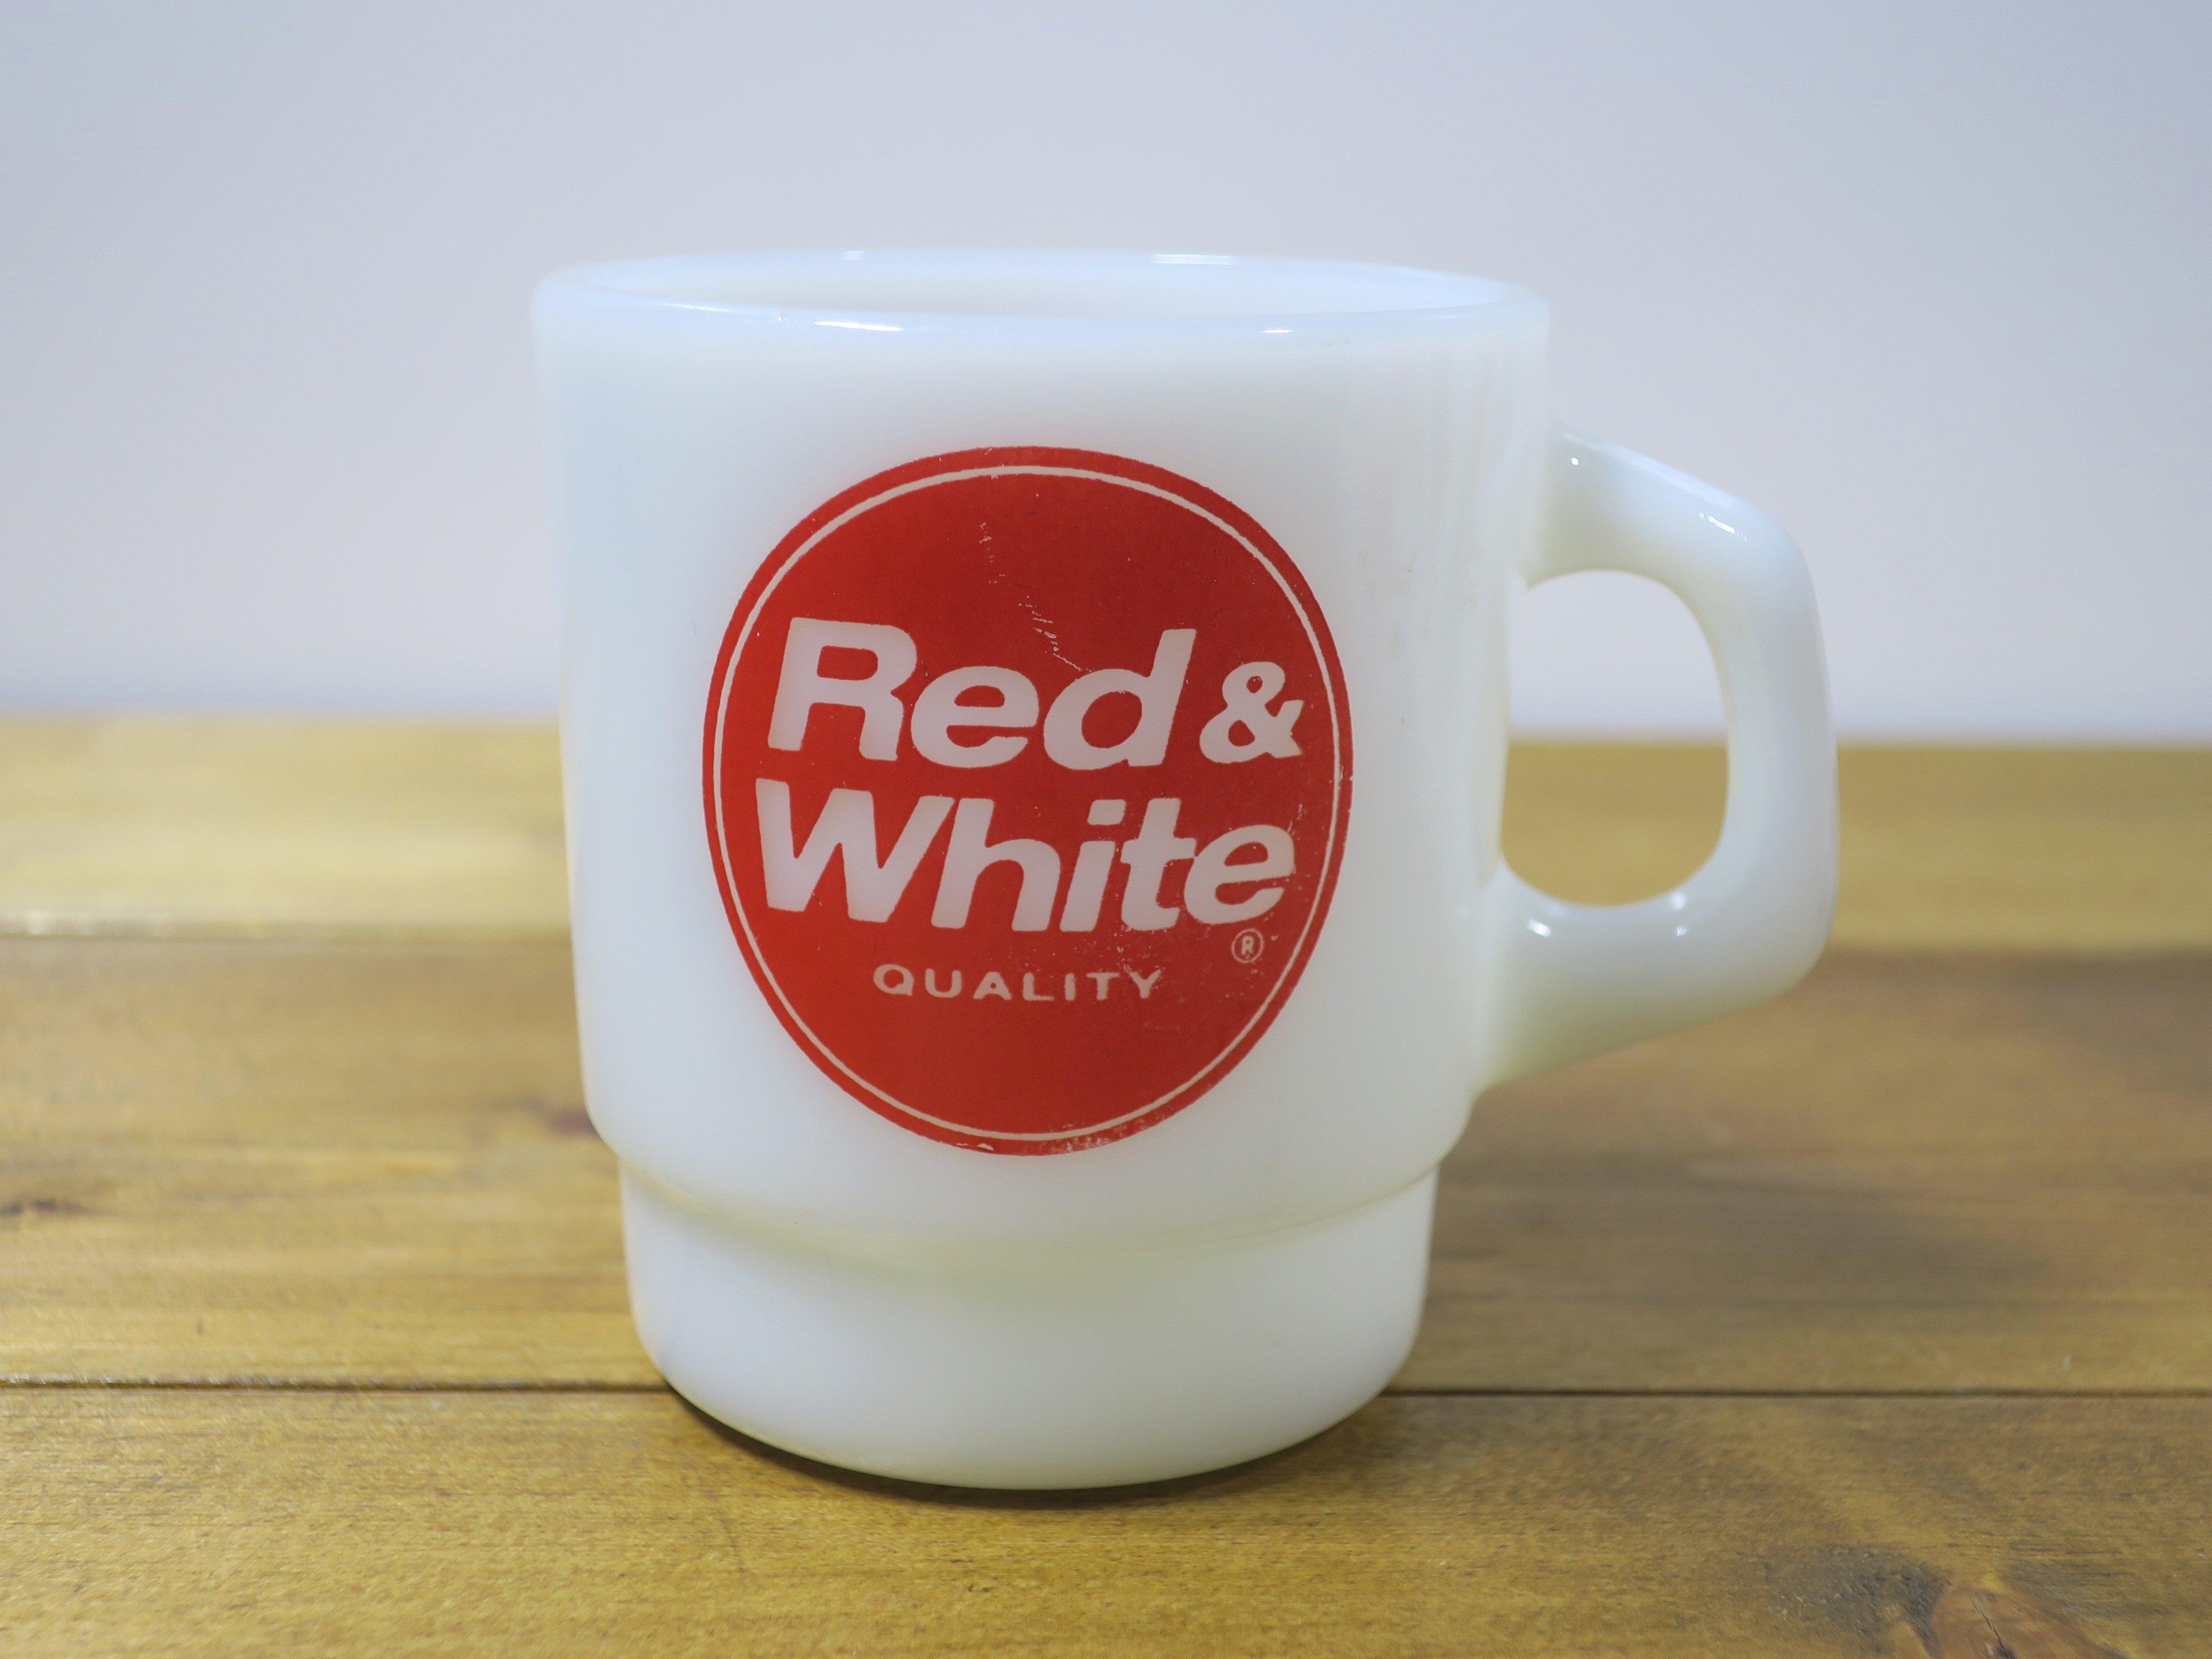 Galaxy ギャラクシー スタッキング/ Red&White